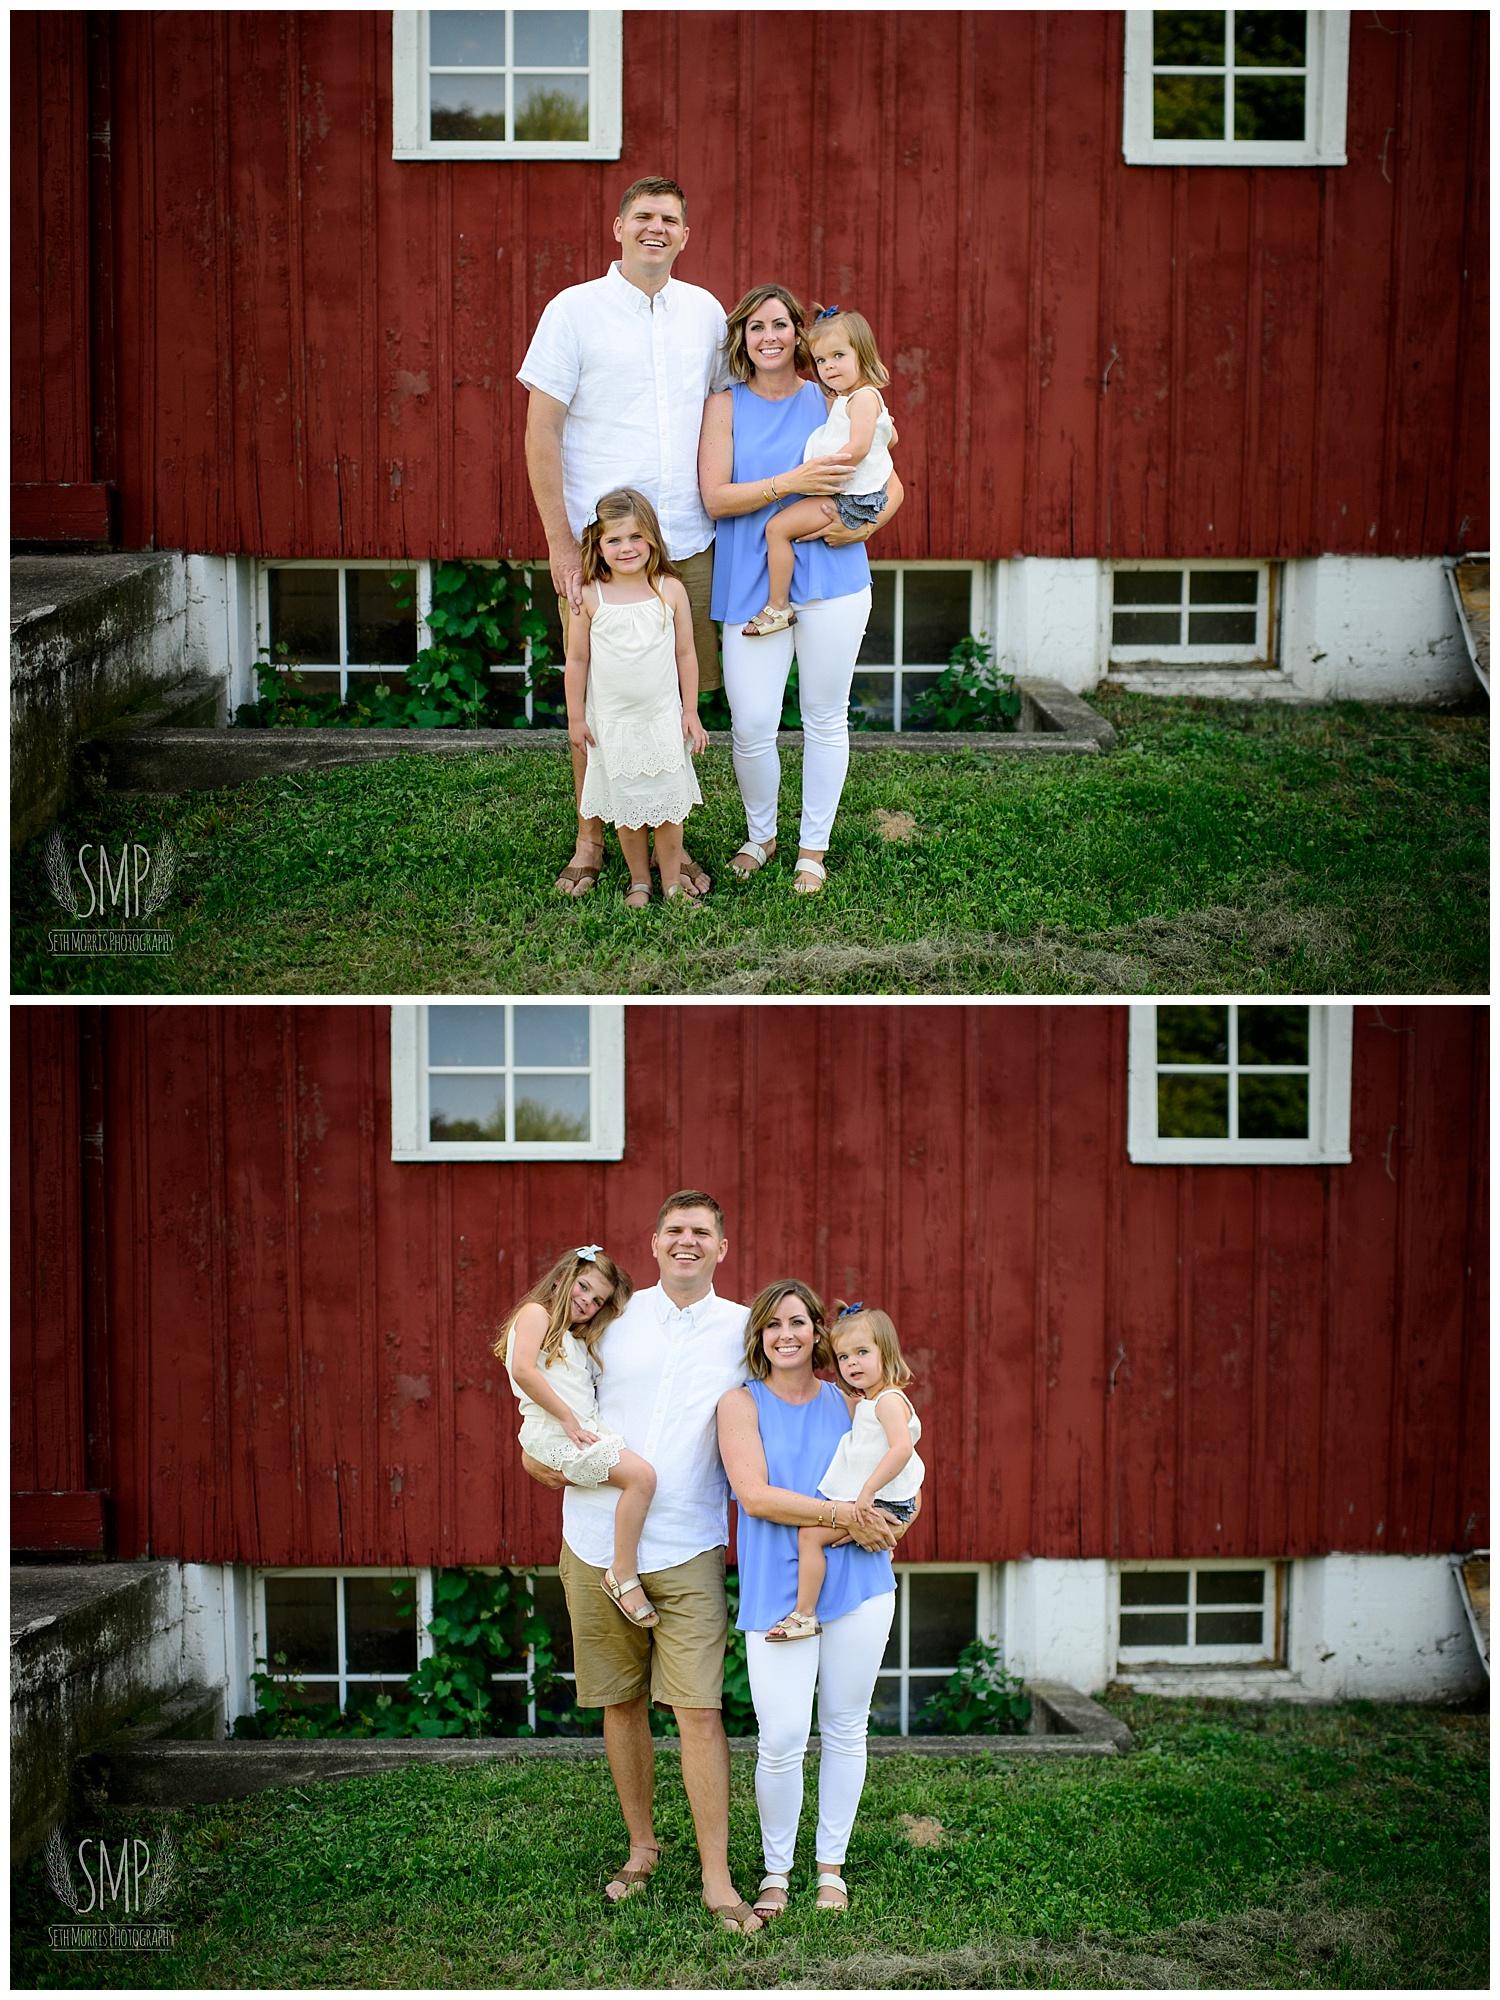 ottawa-family-pictures-outside-nature-1.jpg